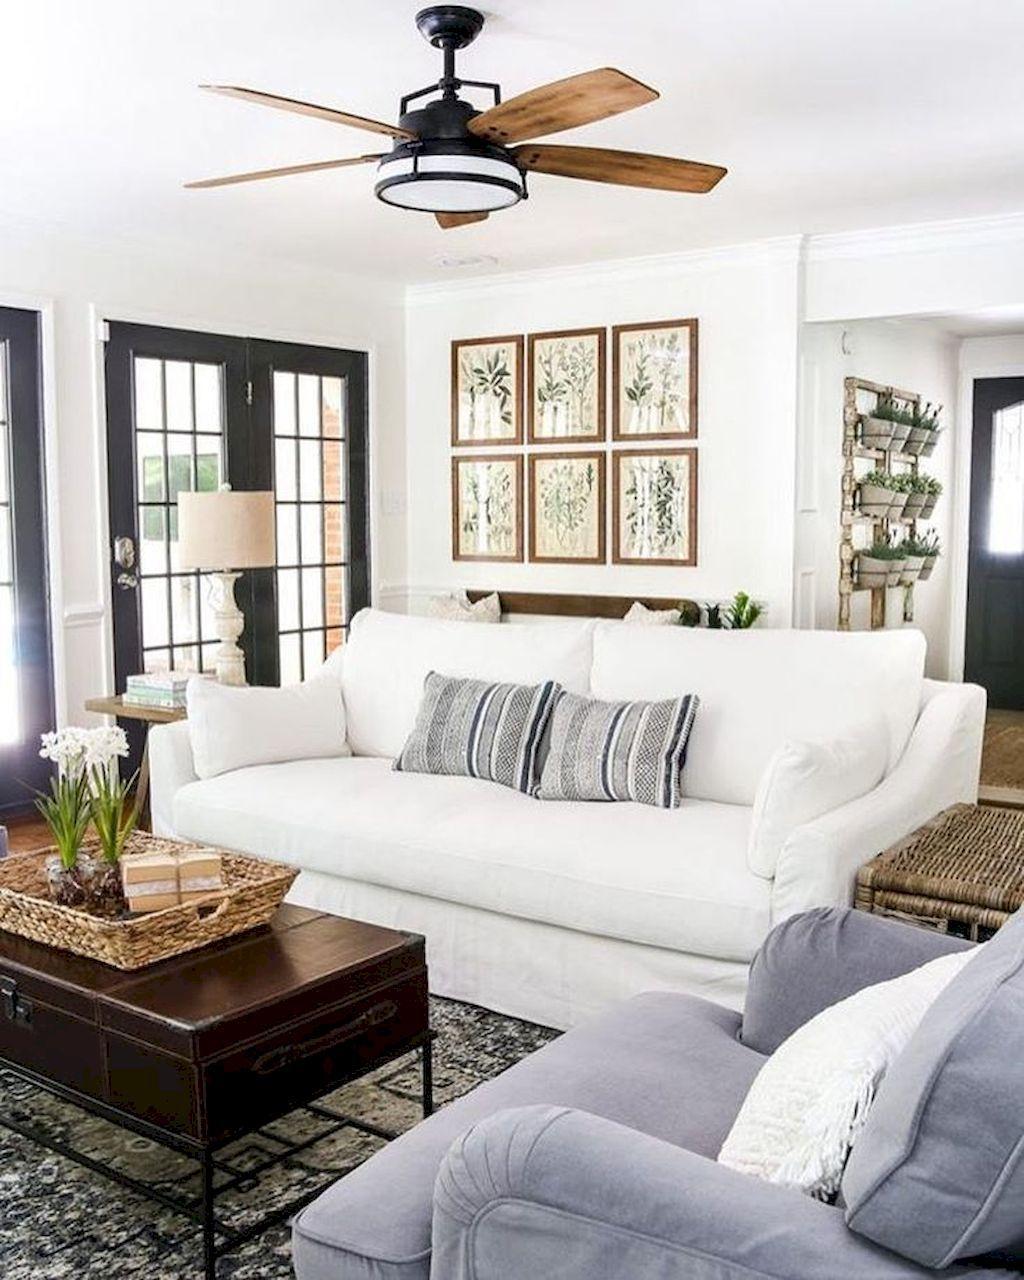 amazing modern farmhouse living room | 38 Amazing Modern Farmhouse Home Decor Ideas | Modern ...